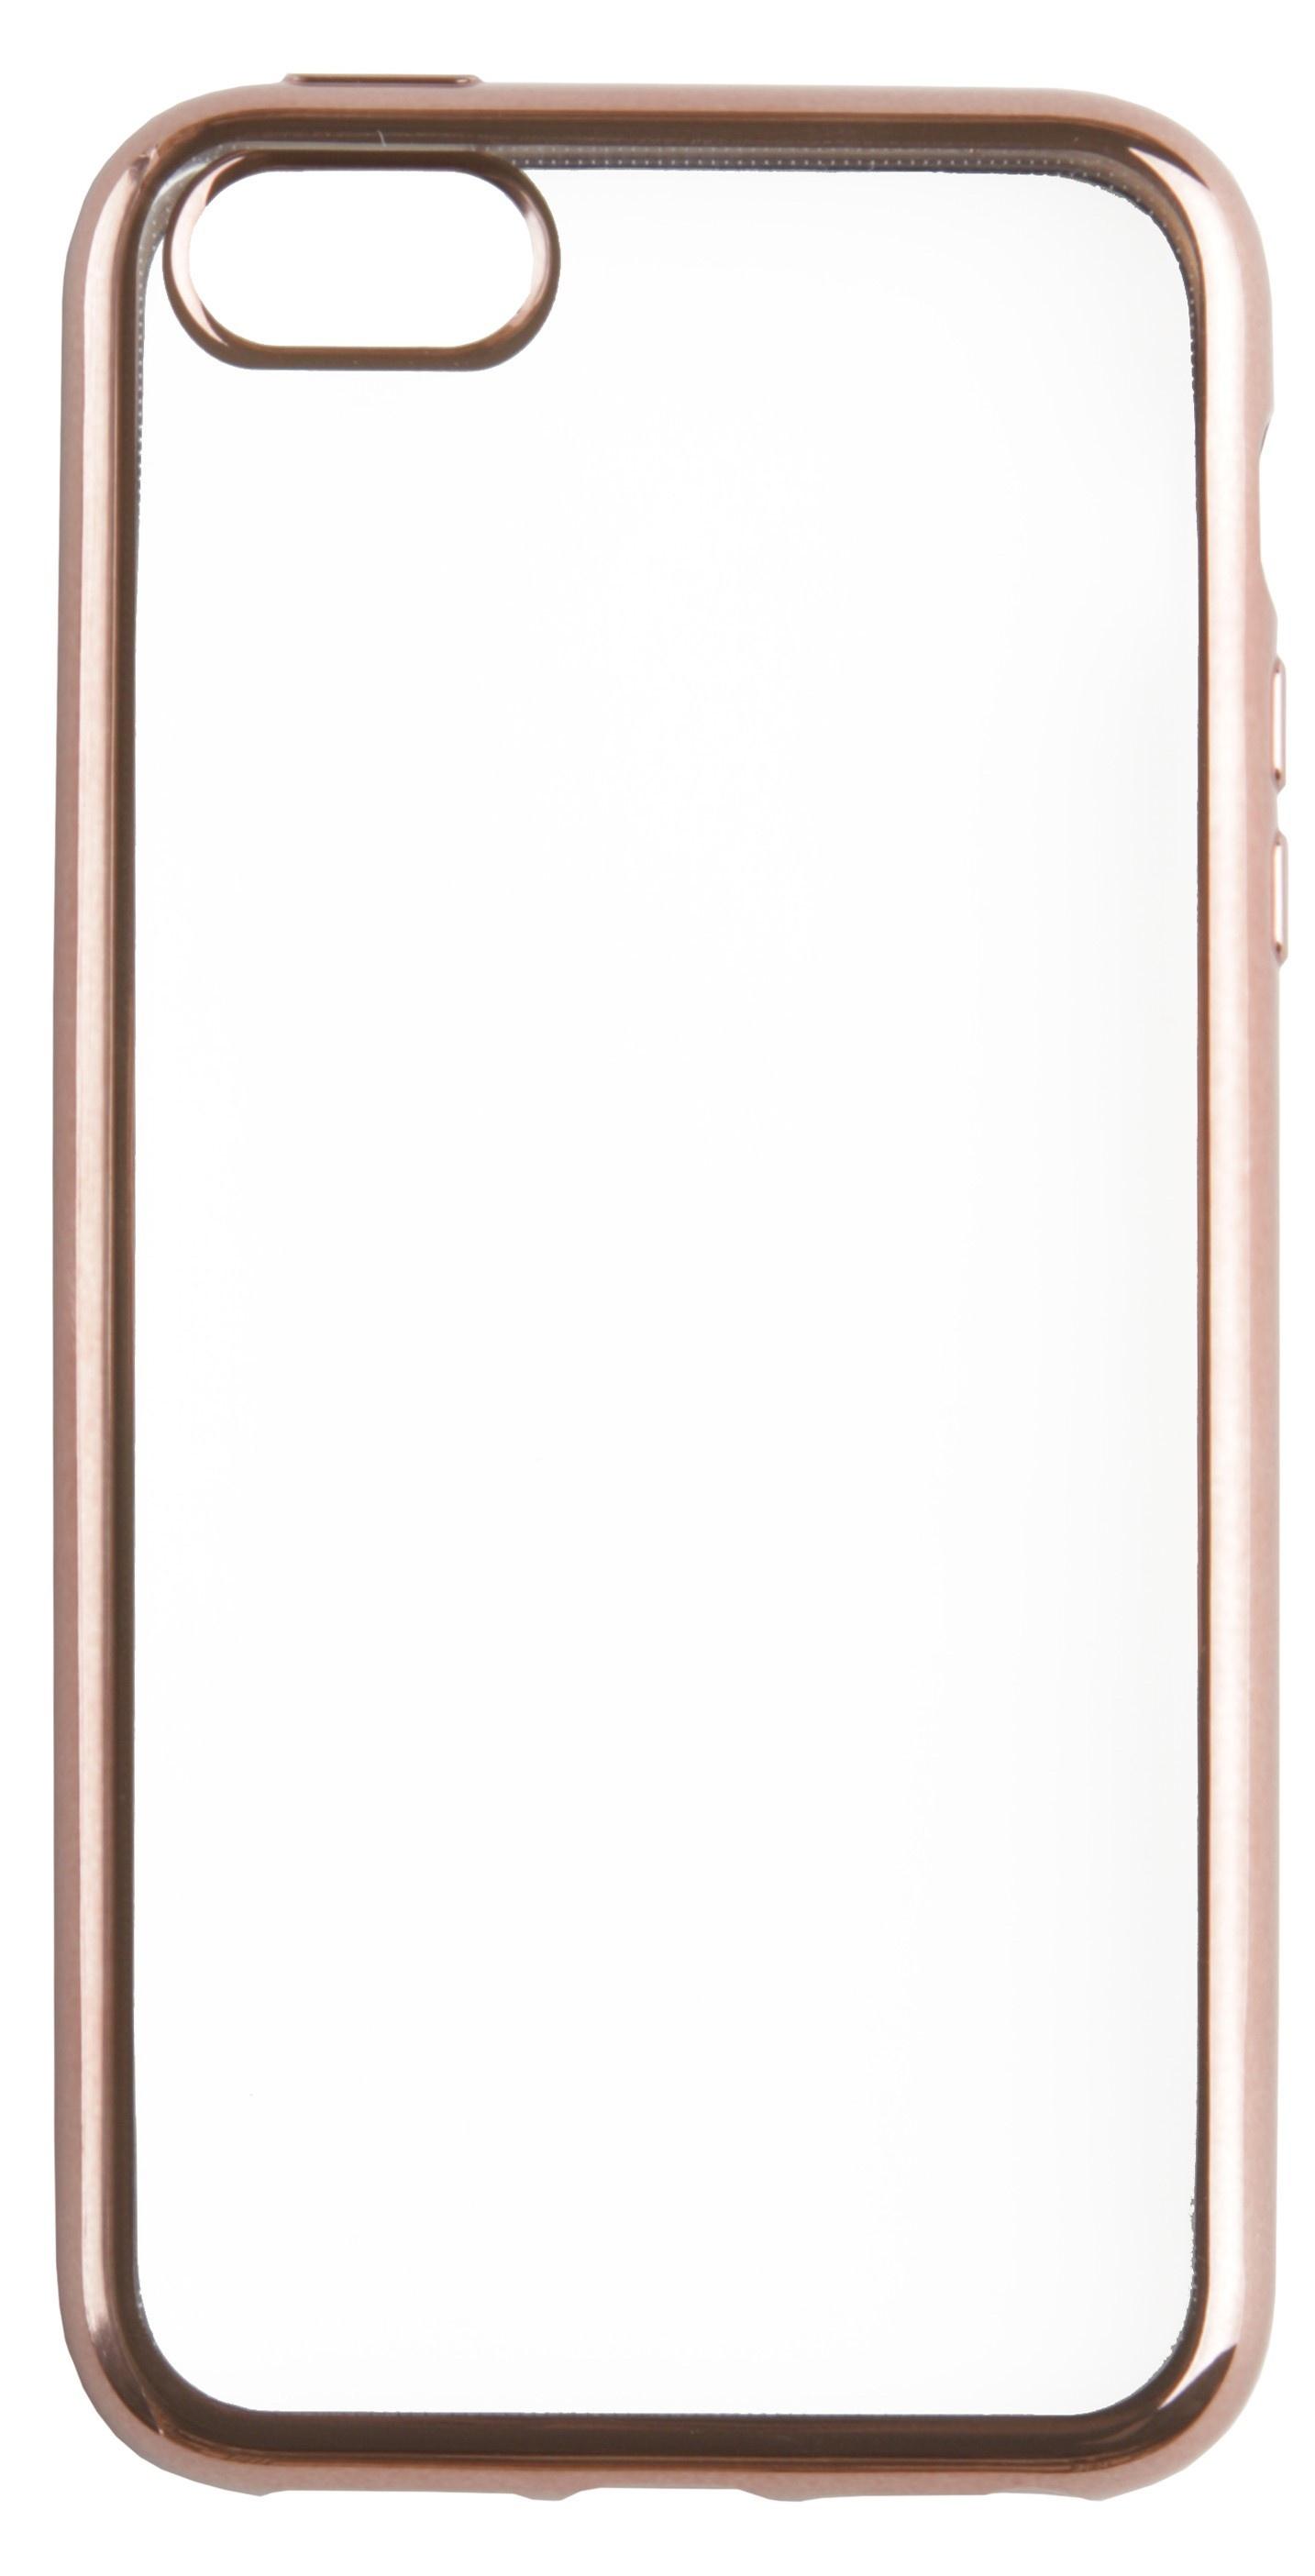 Чехол для сотового телефона skinBOX Silicone chrome border, 4660041409147, розовый skinbox 4people slim silicone чехол накладка для xiaomi redmi 4a transparent